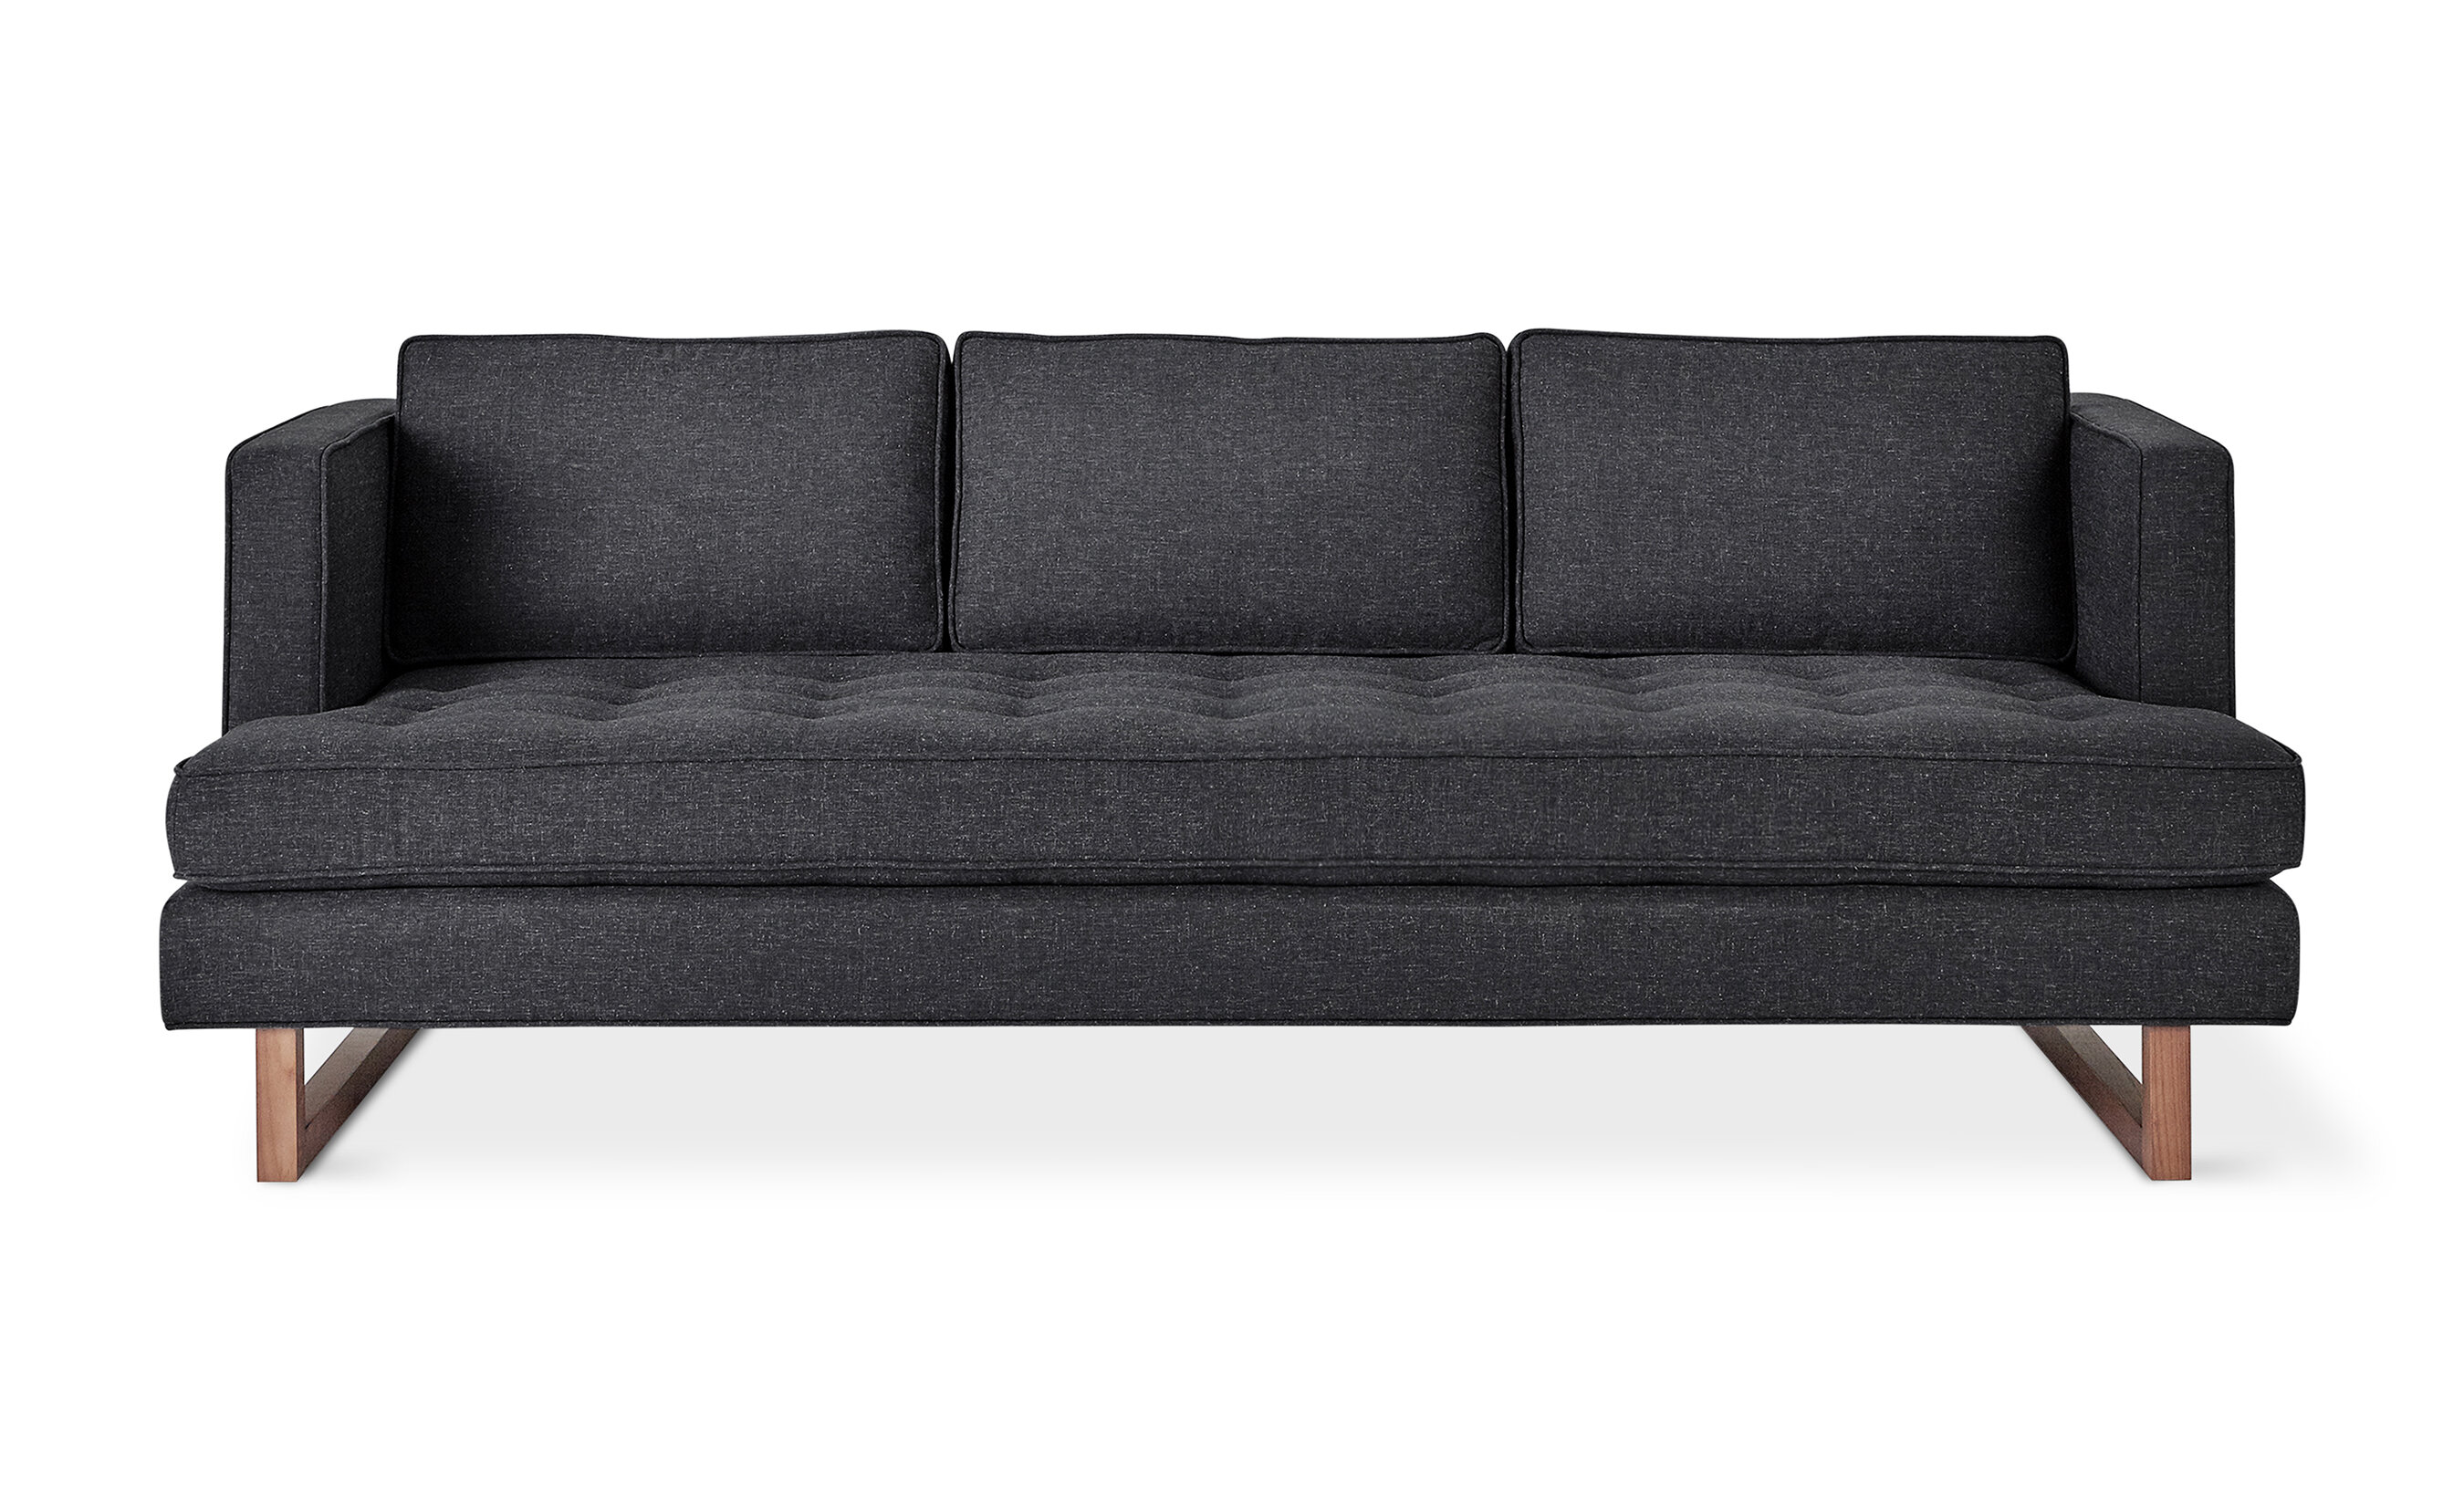 Gus modern aubrey sofa reviews wayfair ca